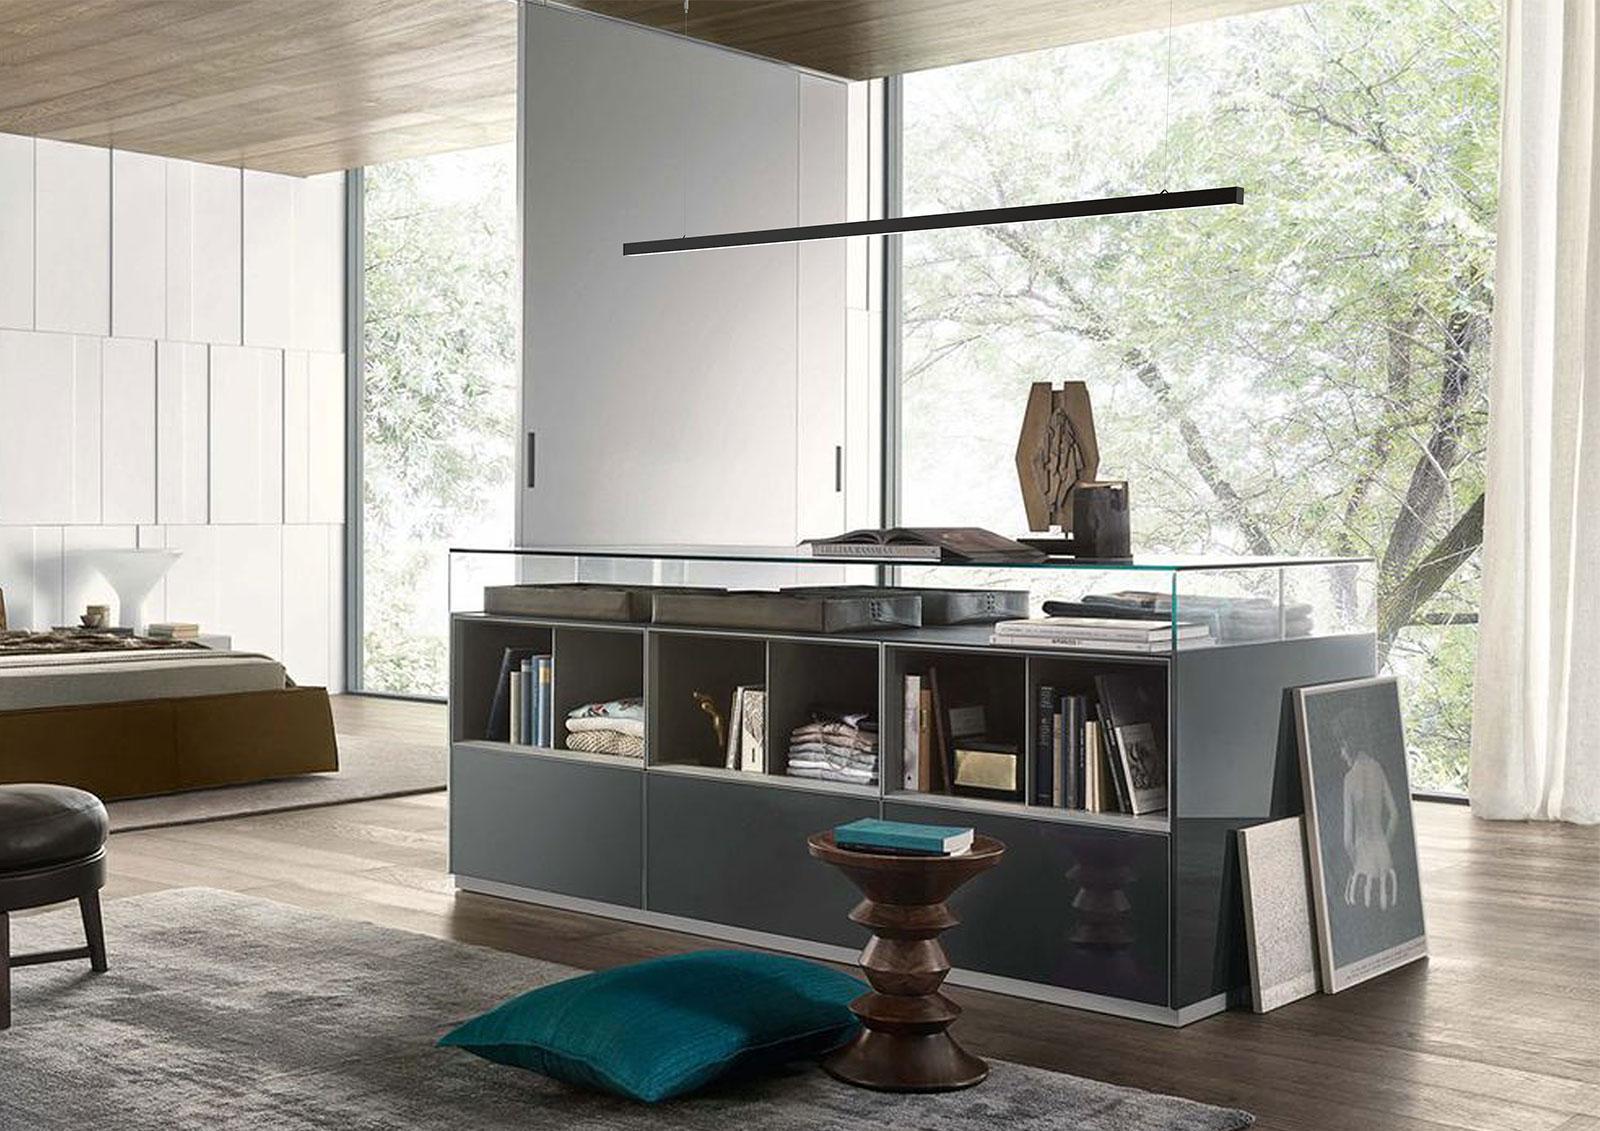 Design-Luce-Profil-035